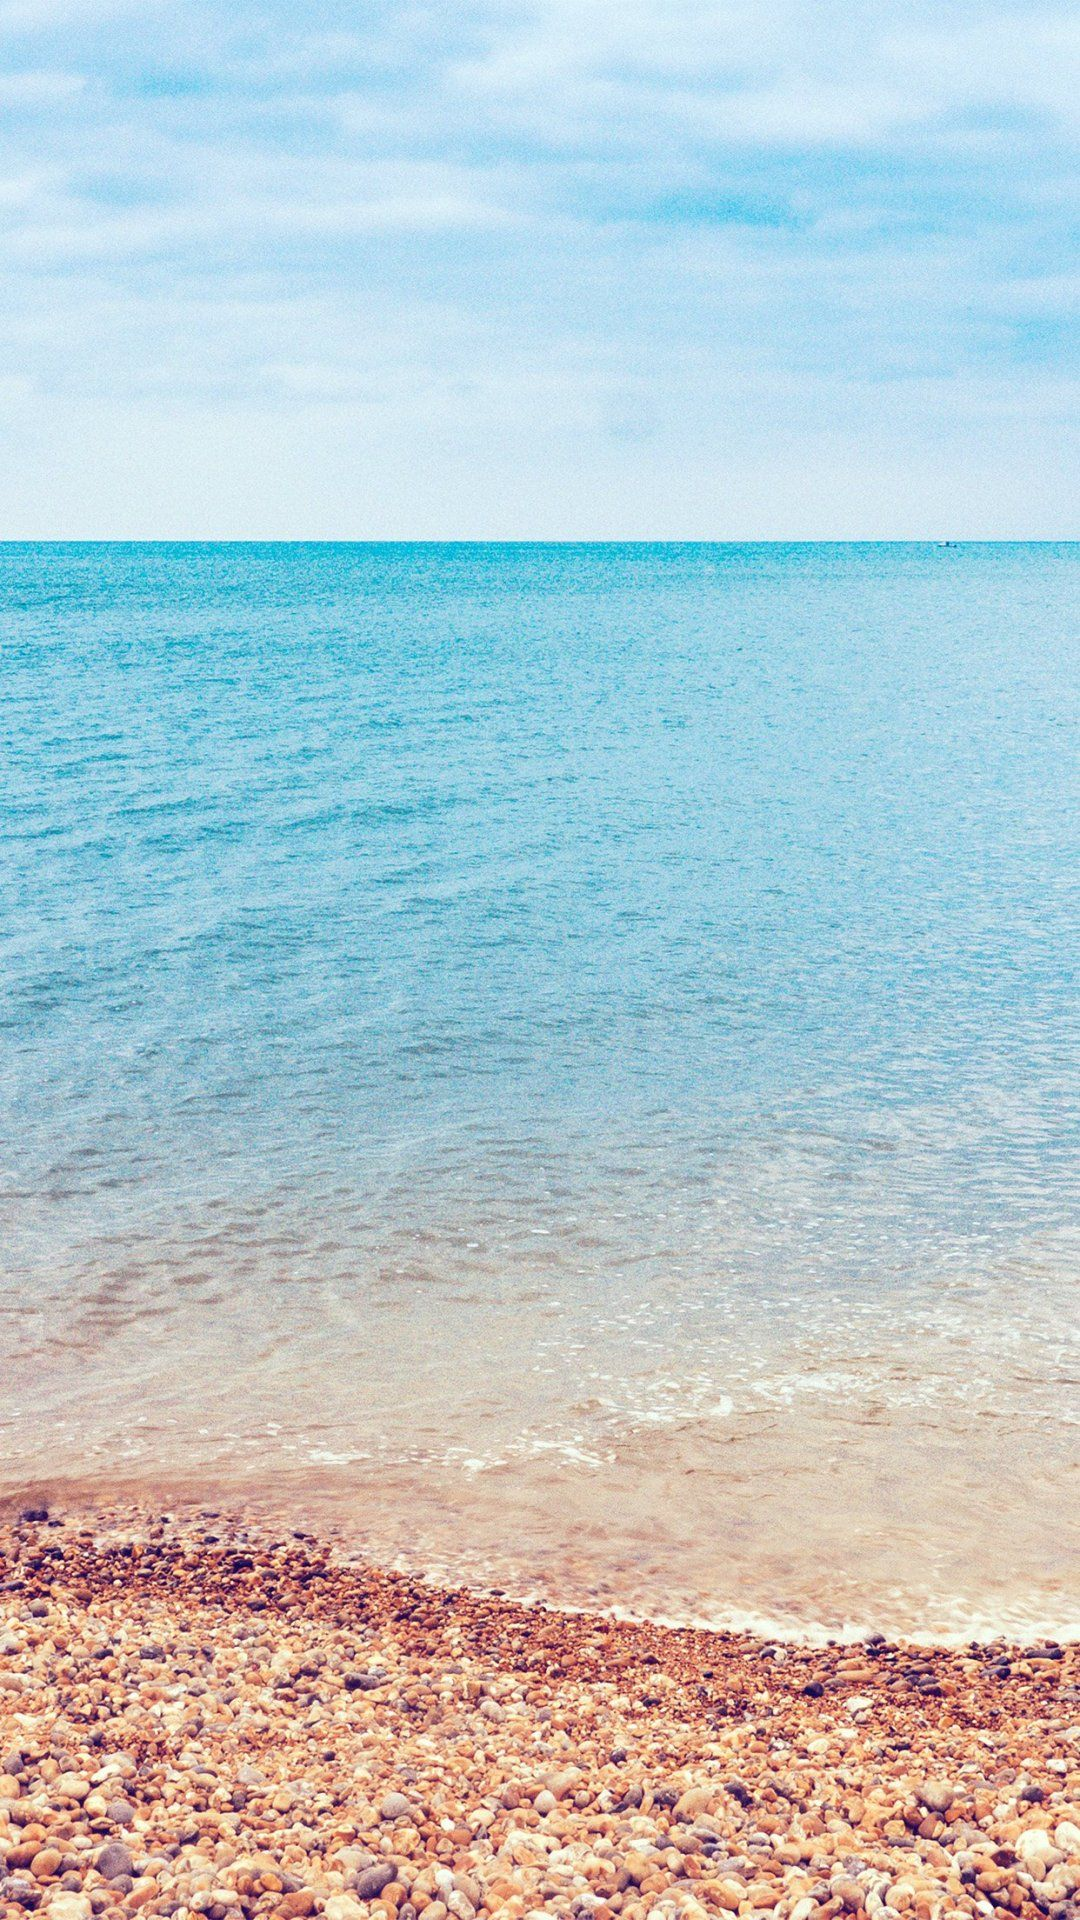 Mobile Wallpapers Sea Nature Beach Blue Sky Rock Happy Iphone6 Plus W Sky Landscape Wallpaper Iphone Summer Nature Beach